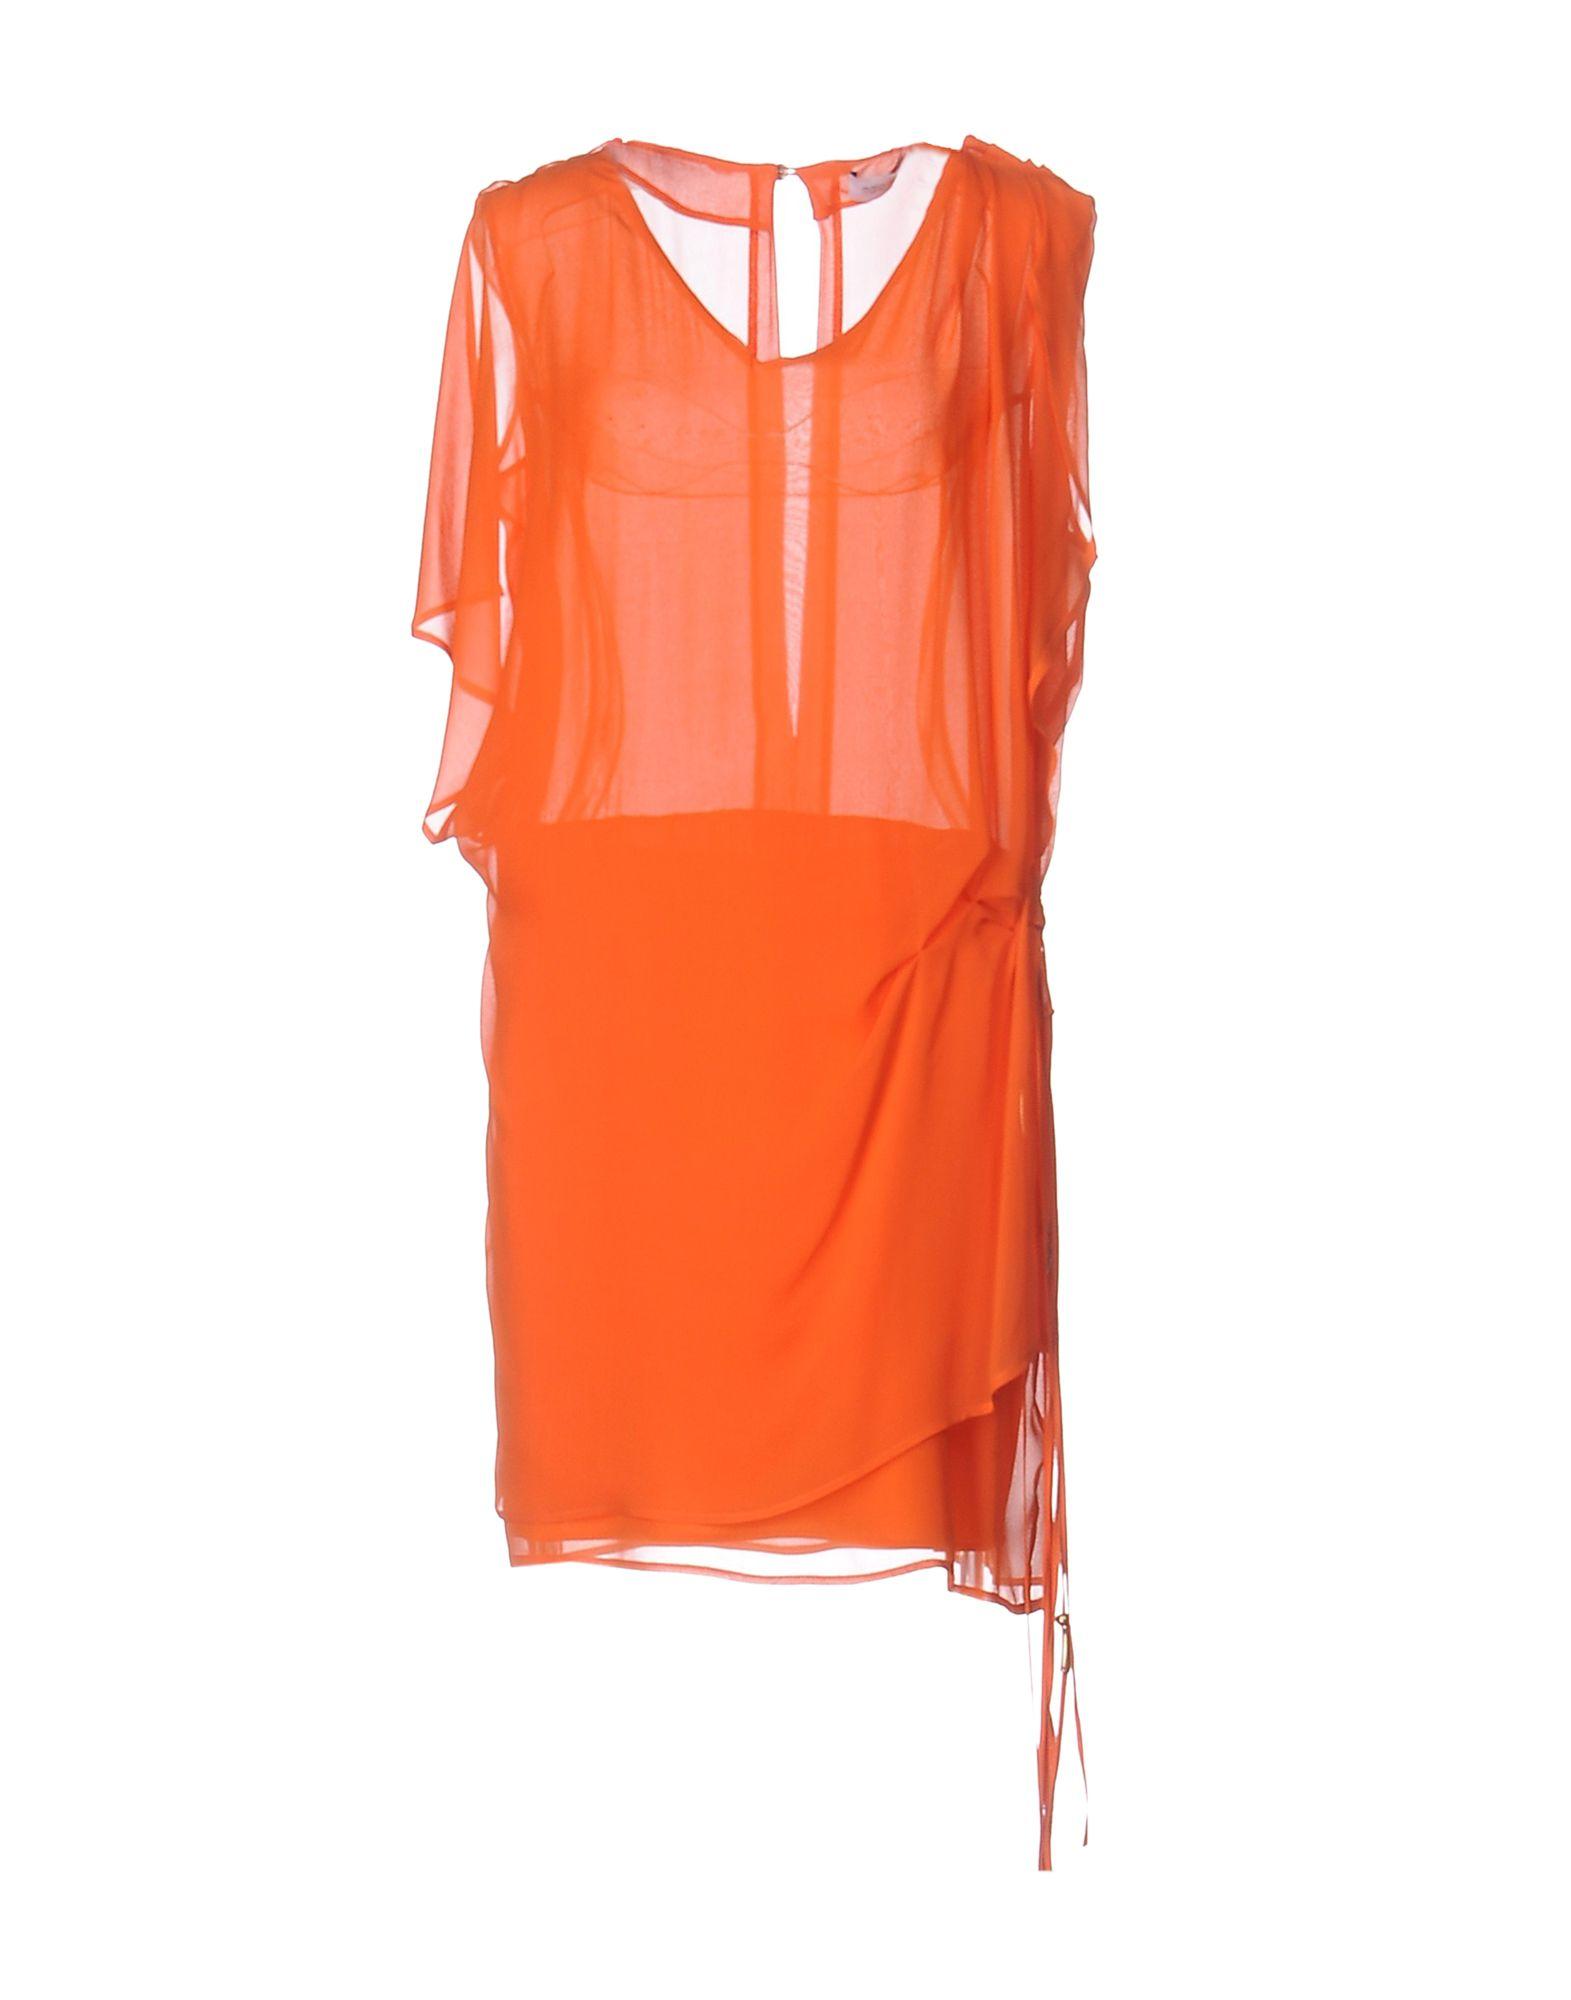 Фото - MARIA GRAZIA SEVERI Короткое платье платье maria rybalchenko maria rybalchenko mp002xw1hk4t